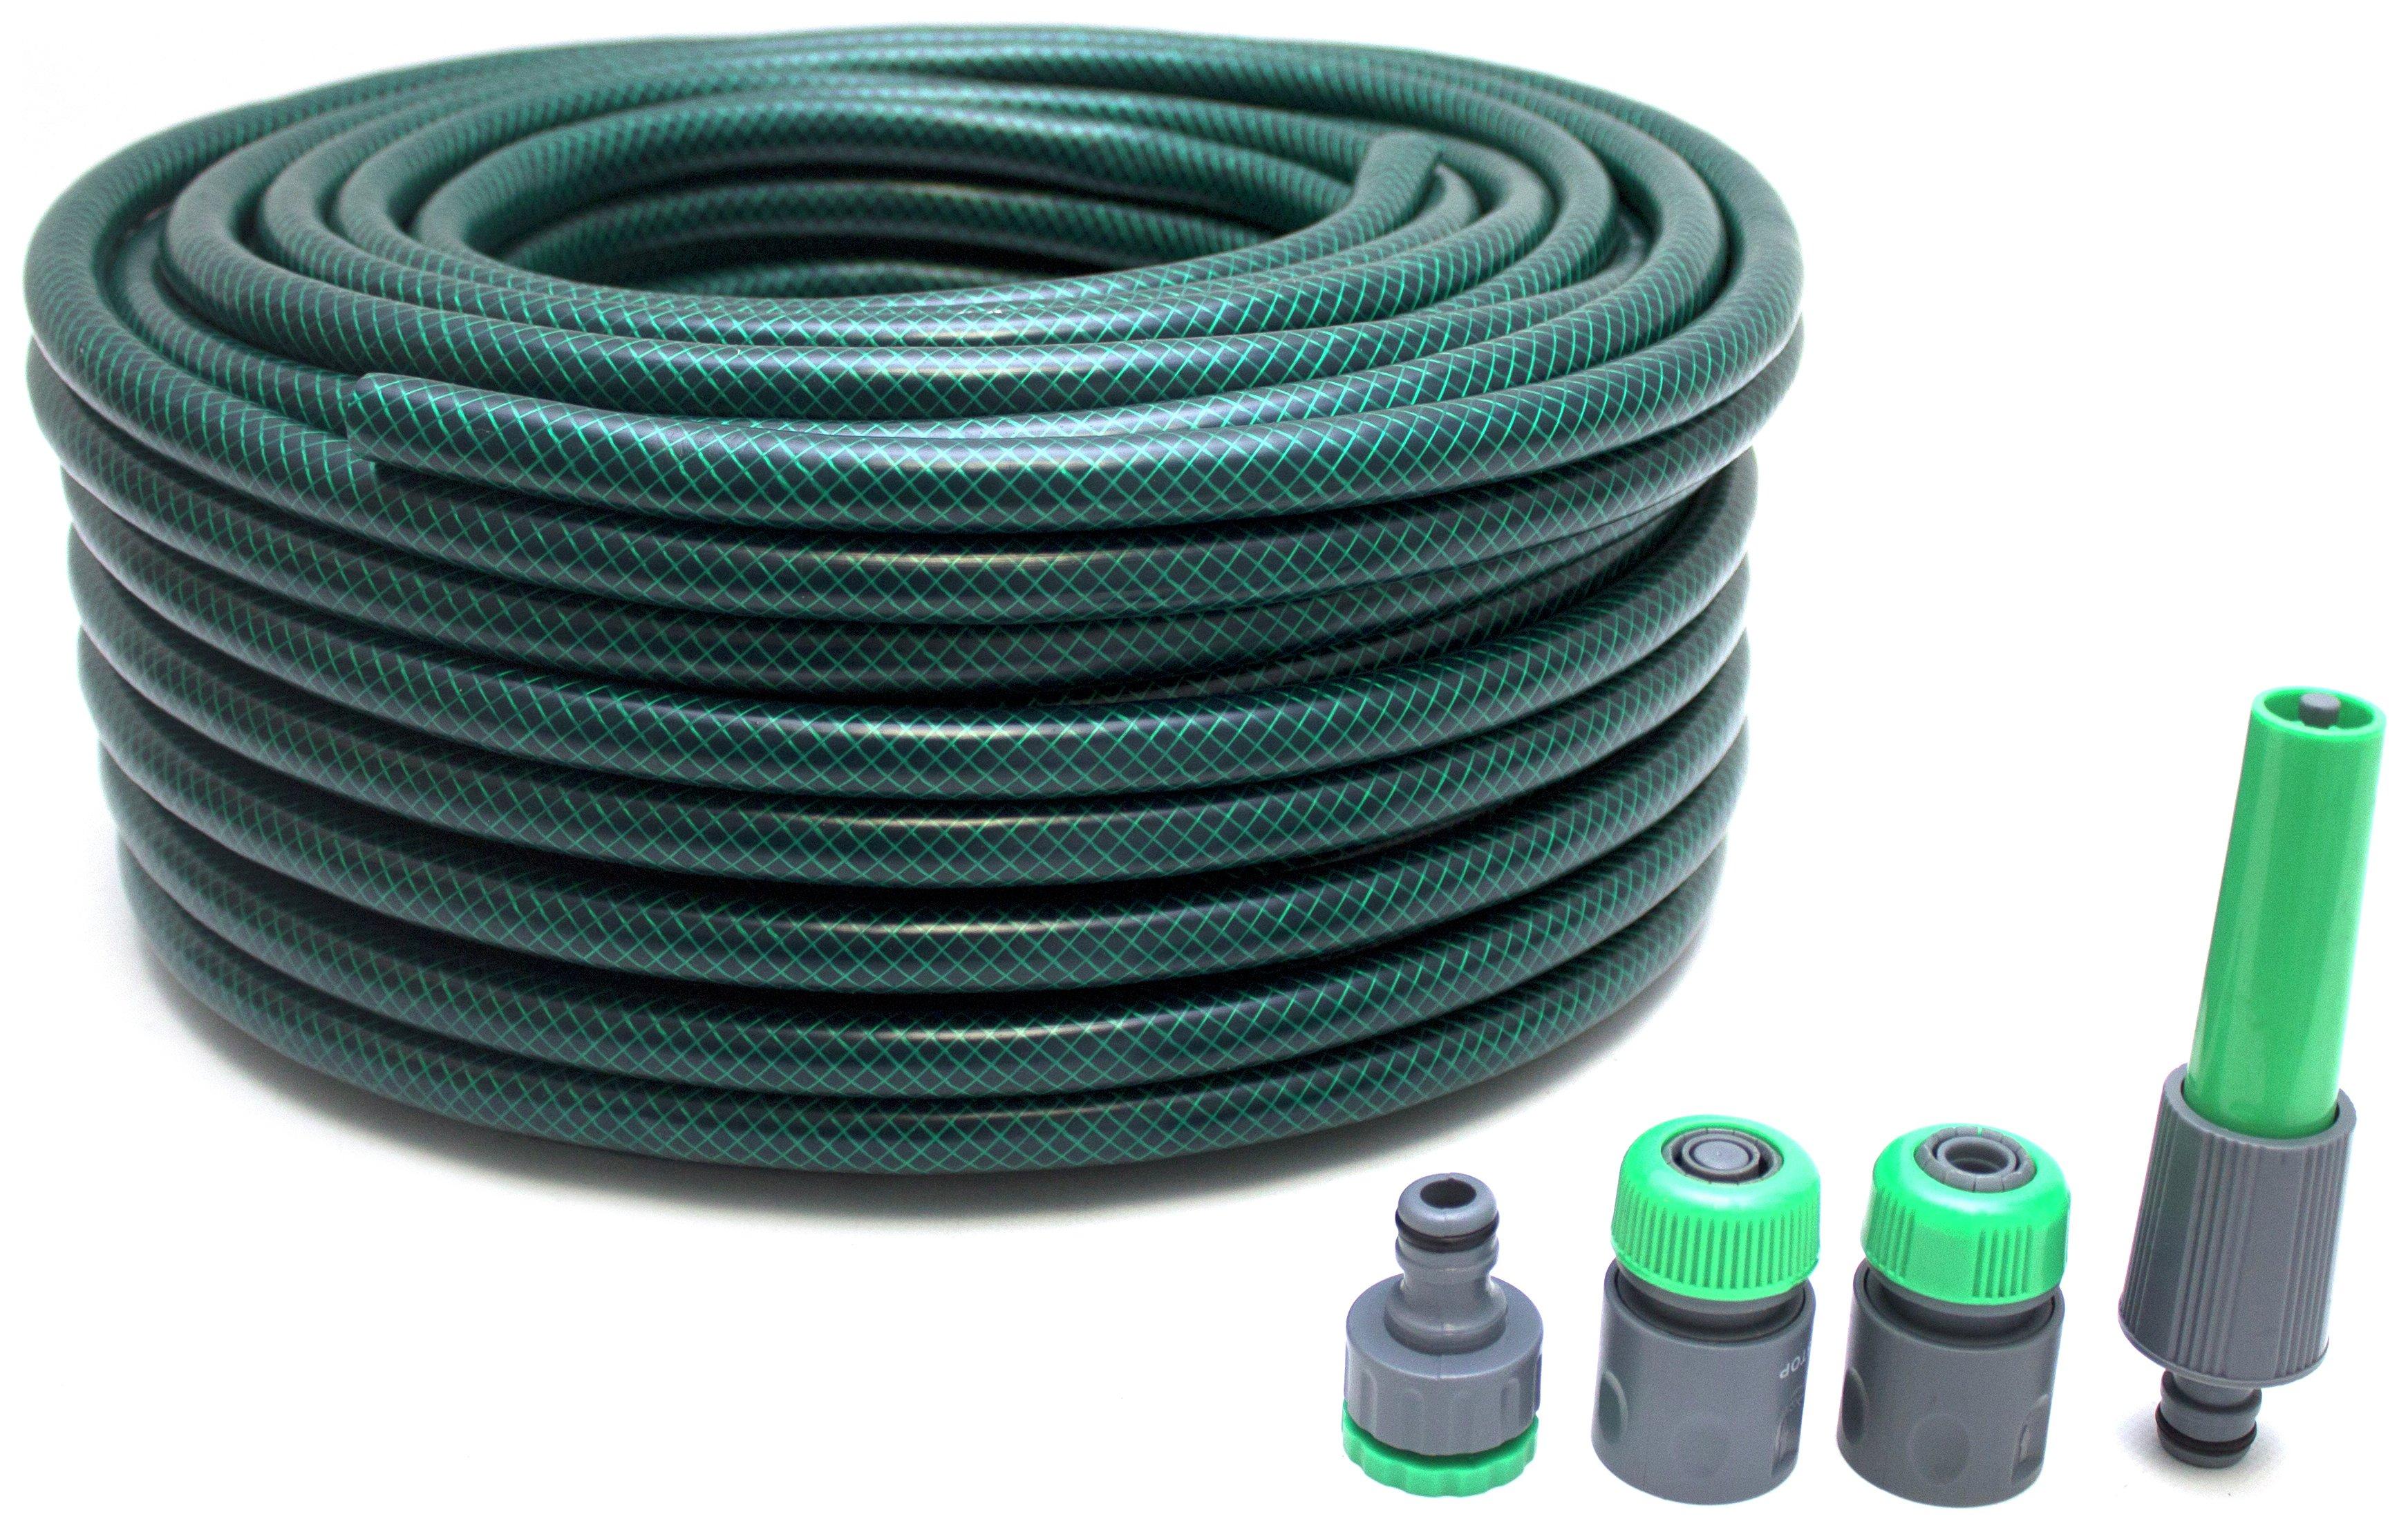 Hose with 4 Connectors - 50m